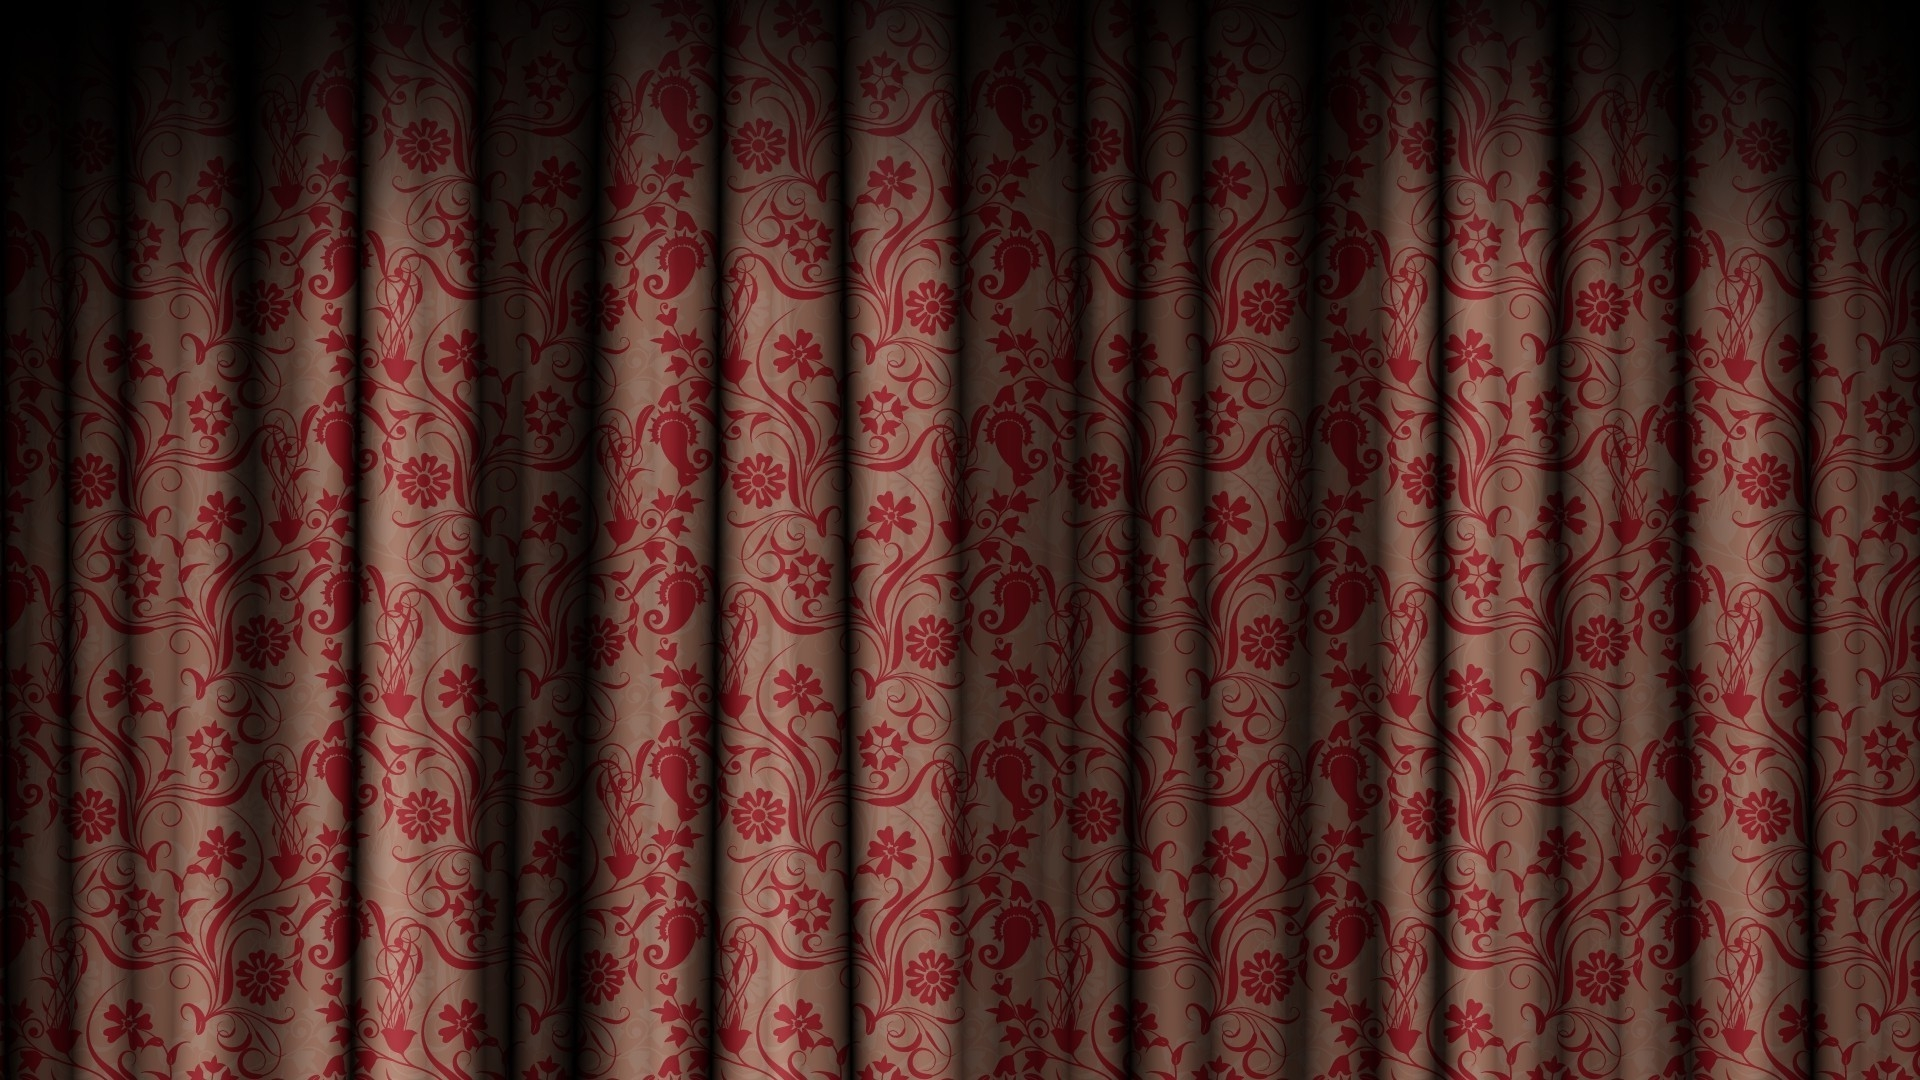 Curtain Wall Texture : Download wallpaper curtain texture patterns